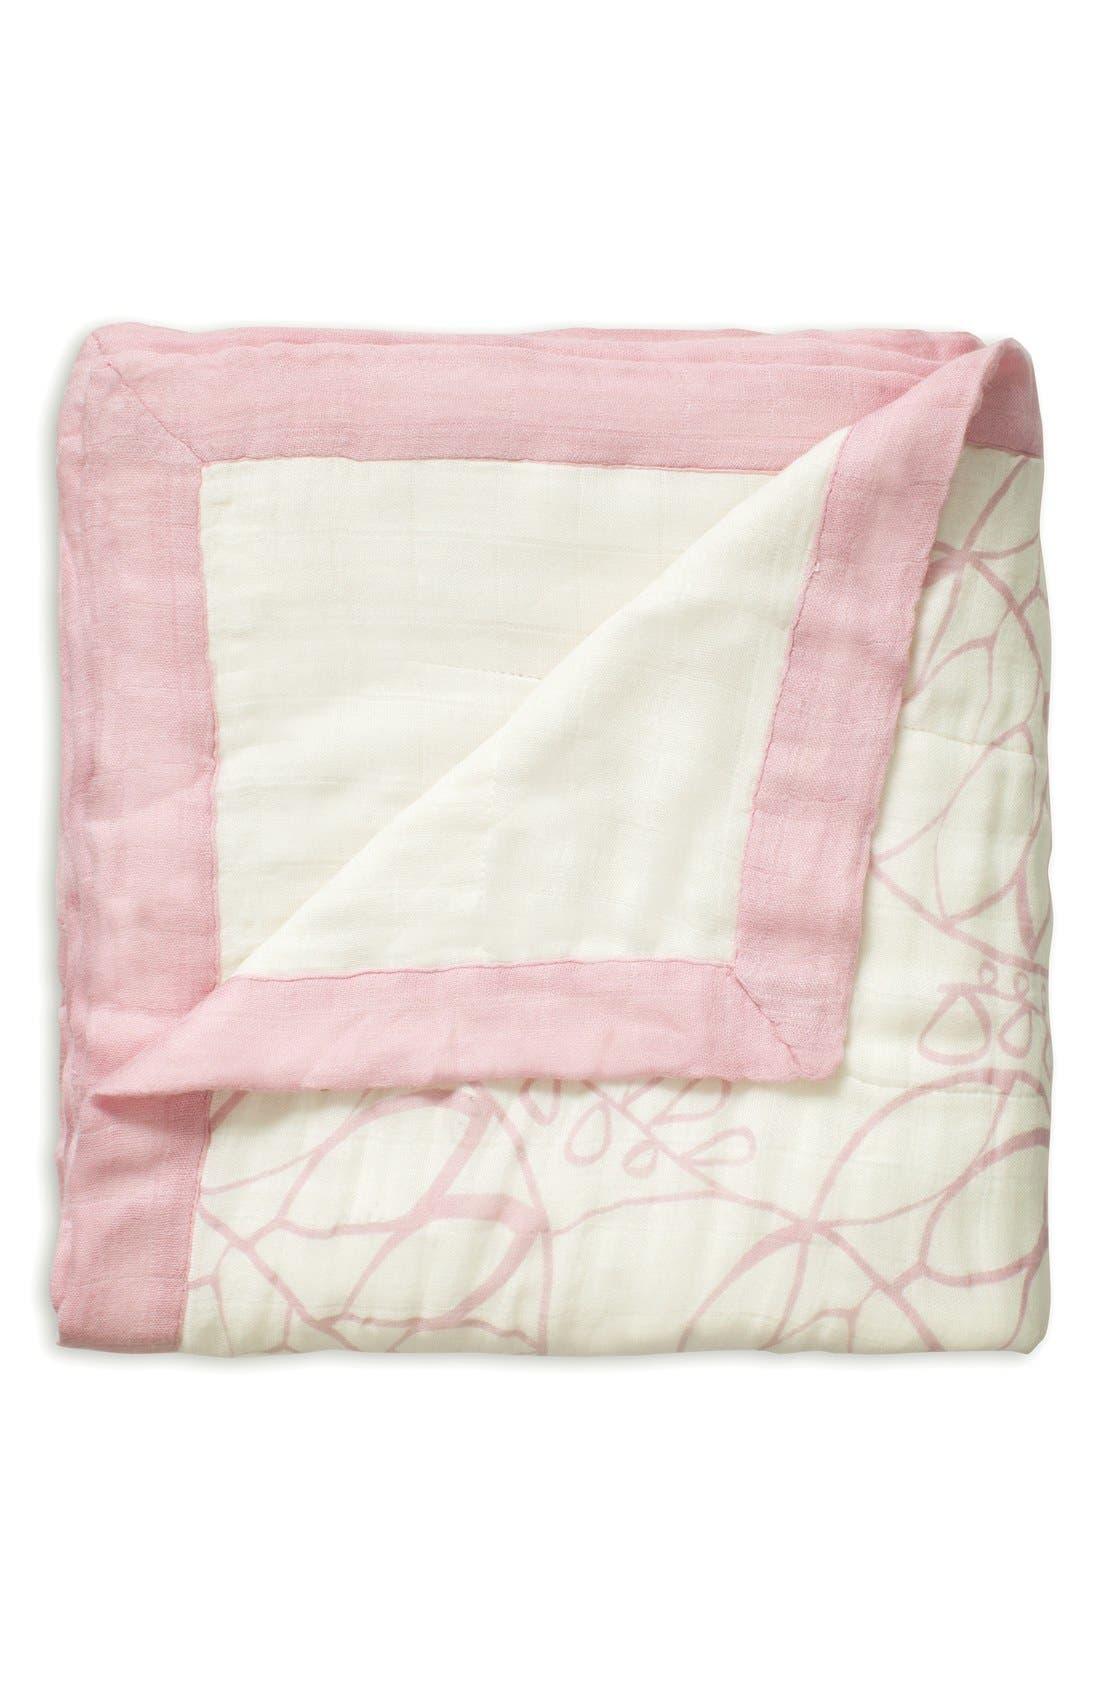 Alternate Image 1 Selected - aden + anais Dream Blanket